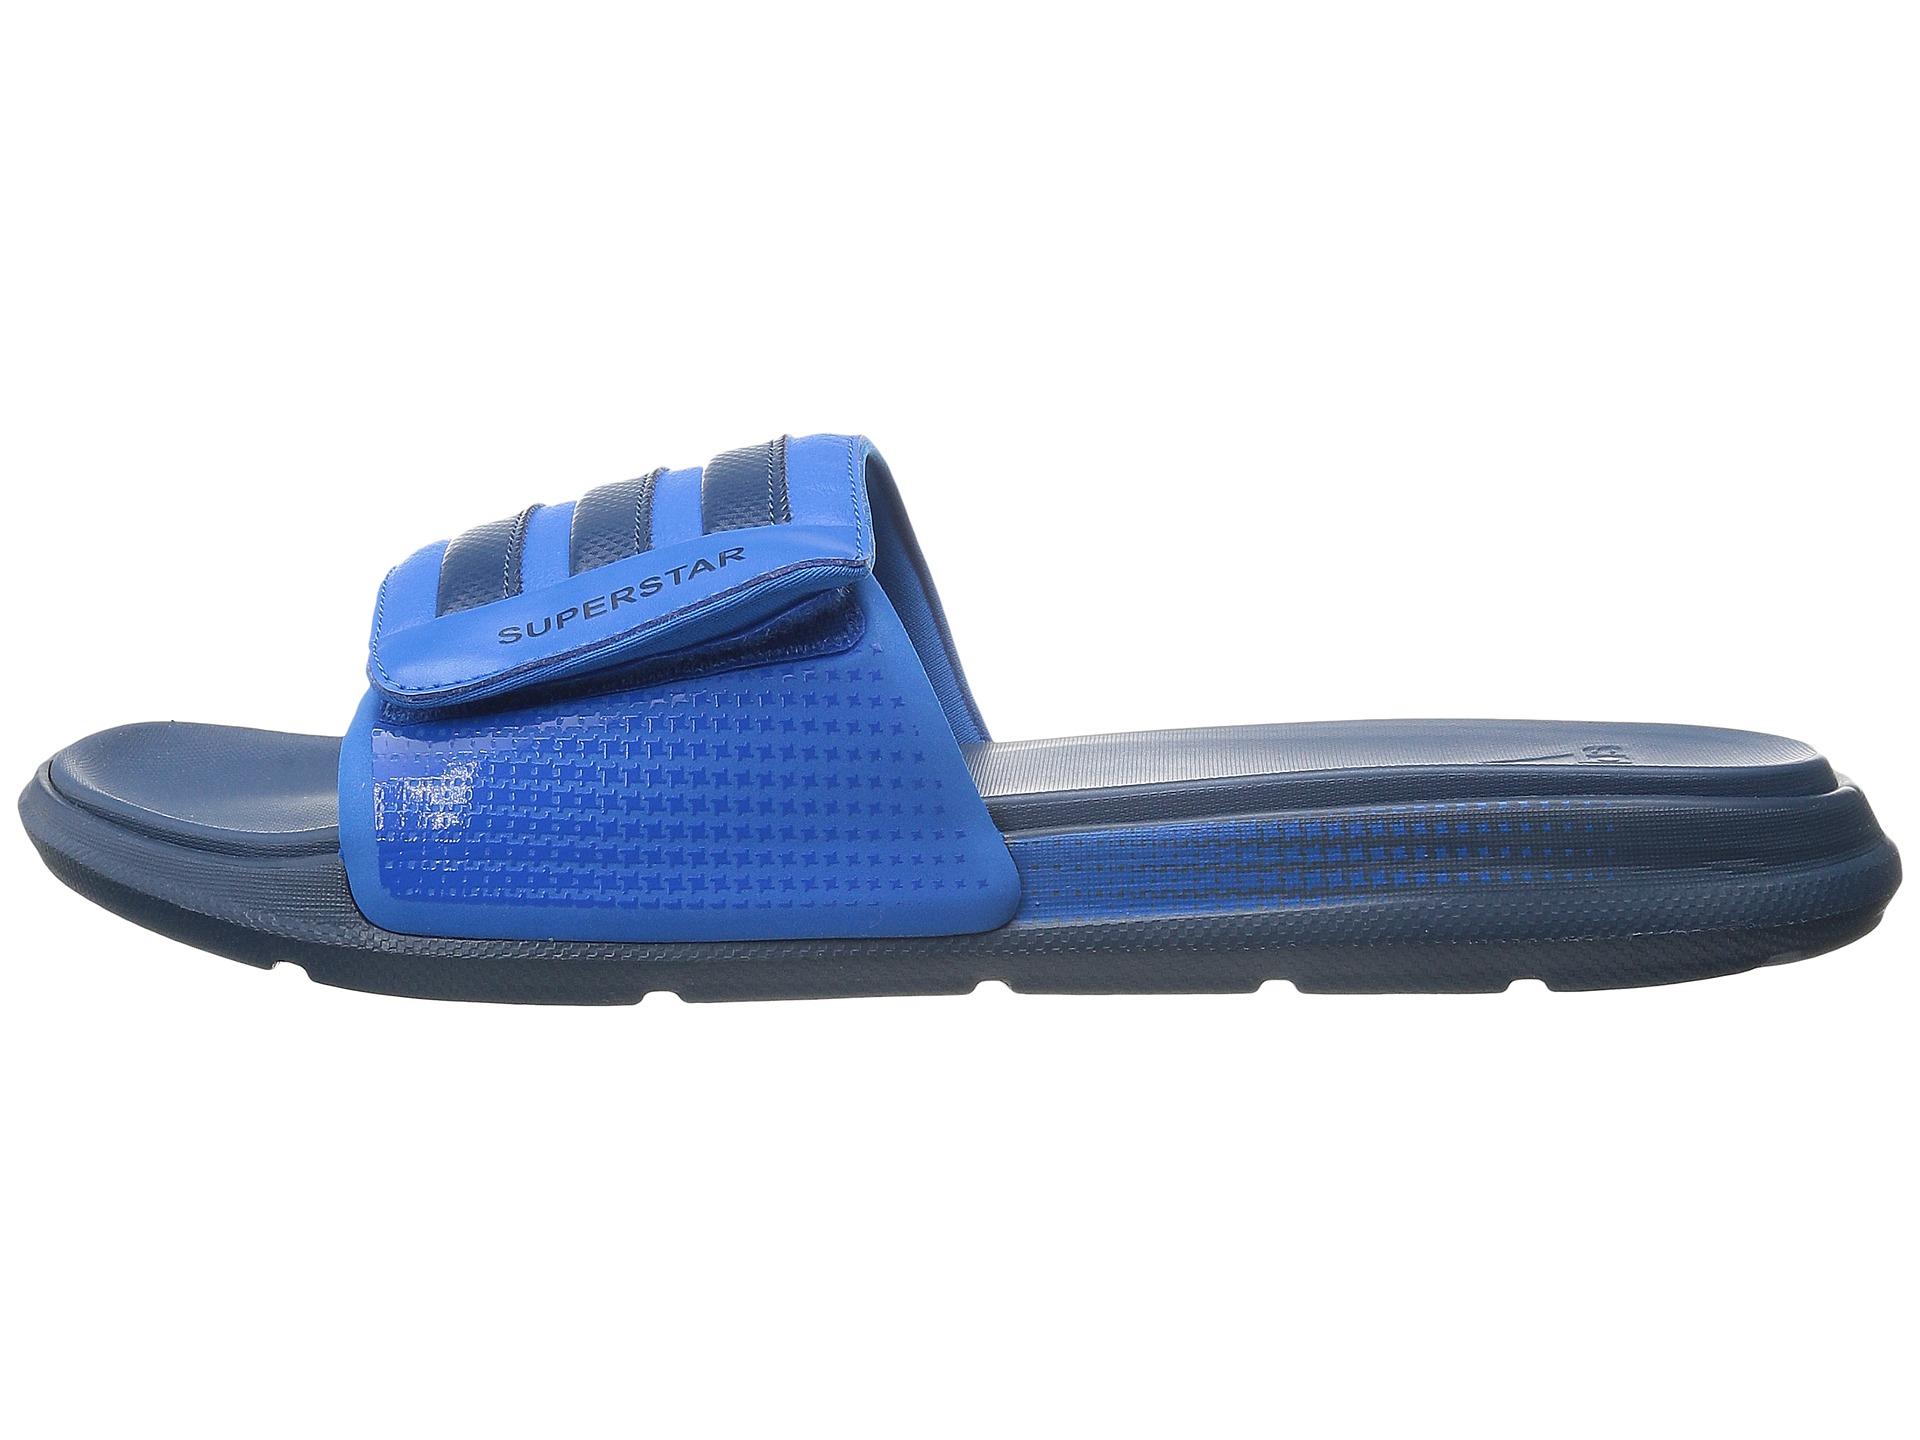 f75195e0890 ... lyst adidas originals superstar 4g m in blue